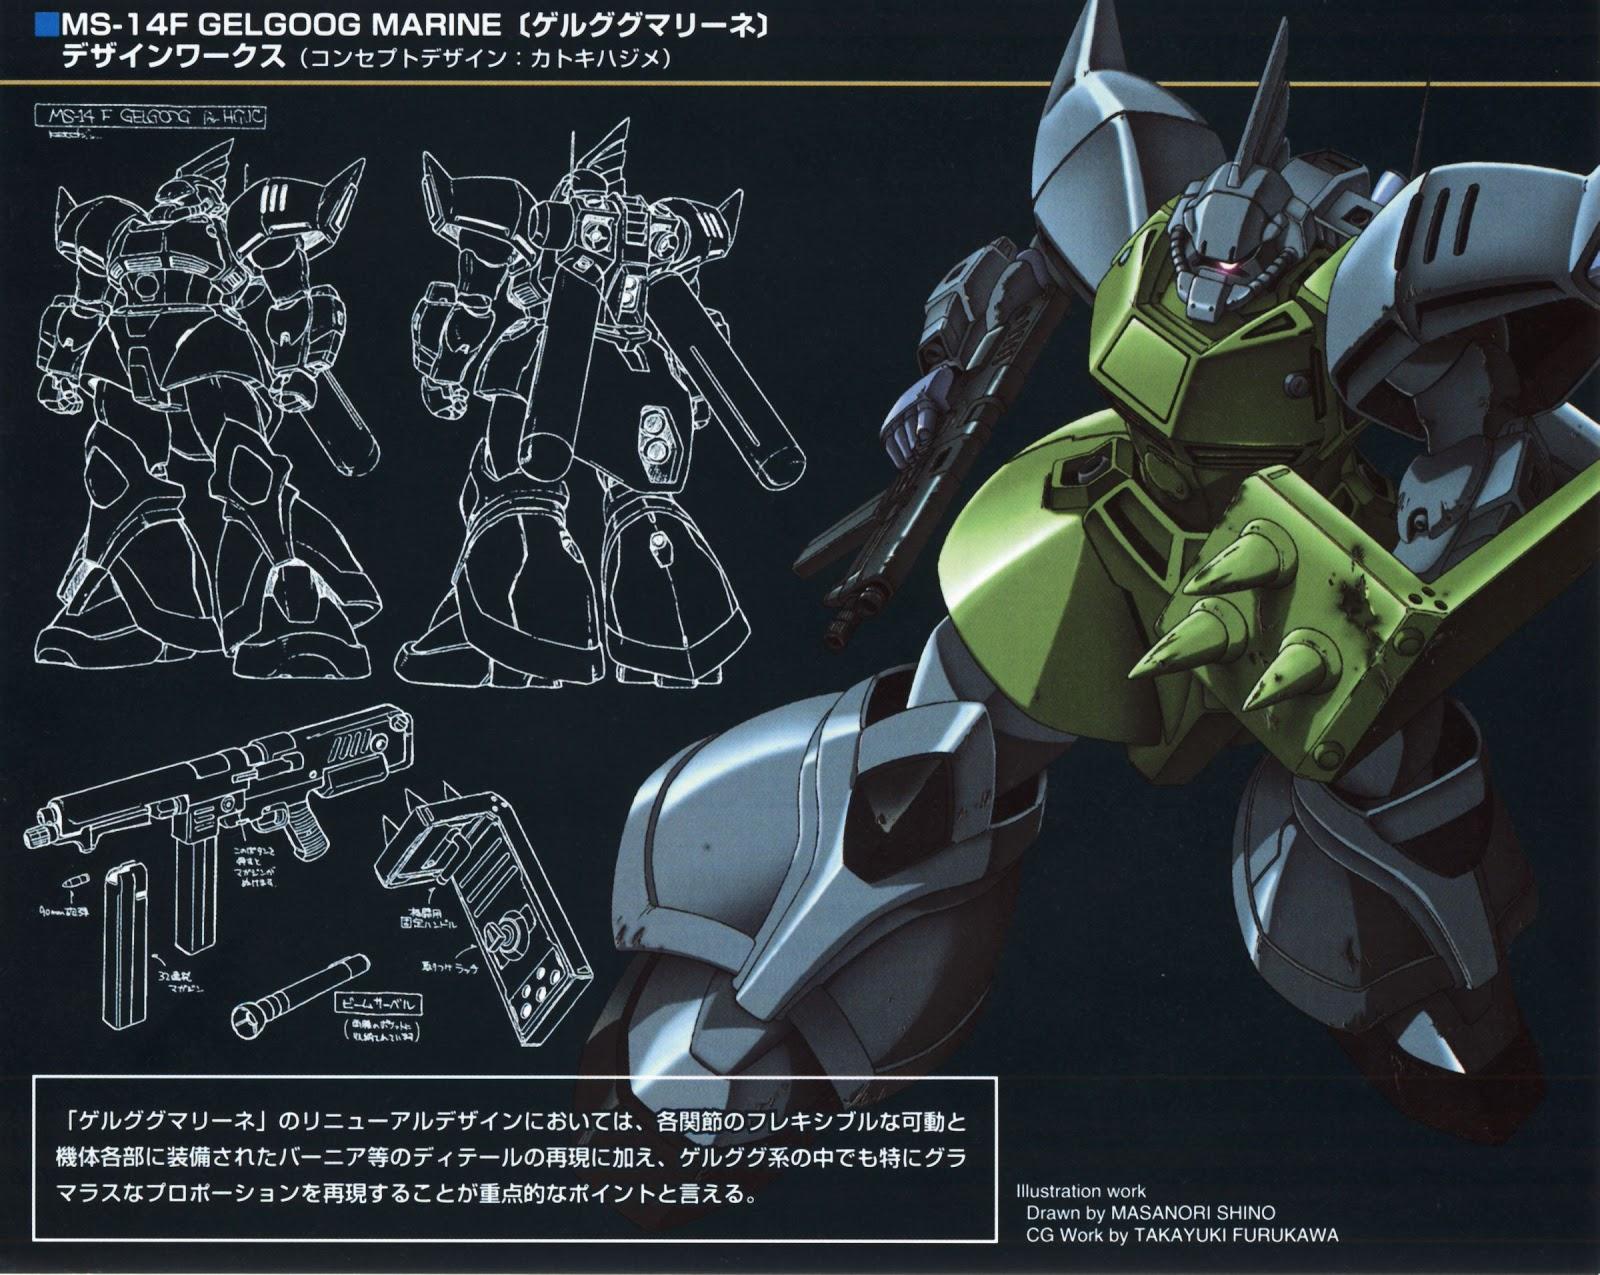 Gundam Walls and LOLS MS 14F Gelgoog Marine HGUC Wallpaper 1600x1275